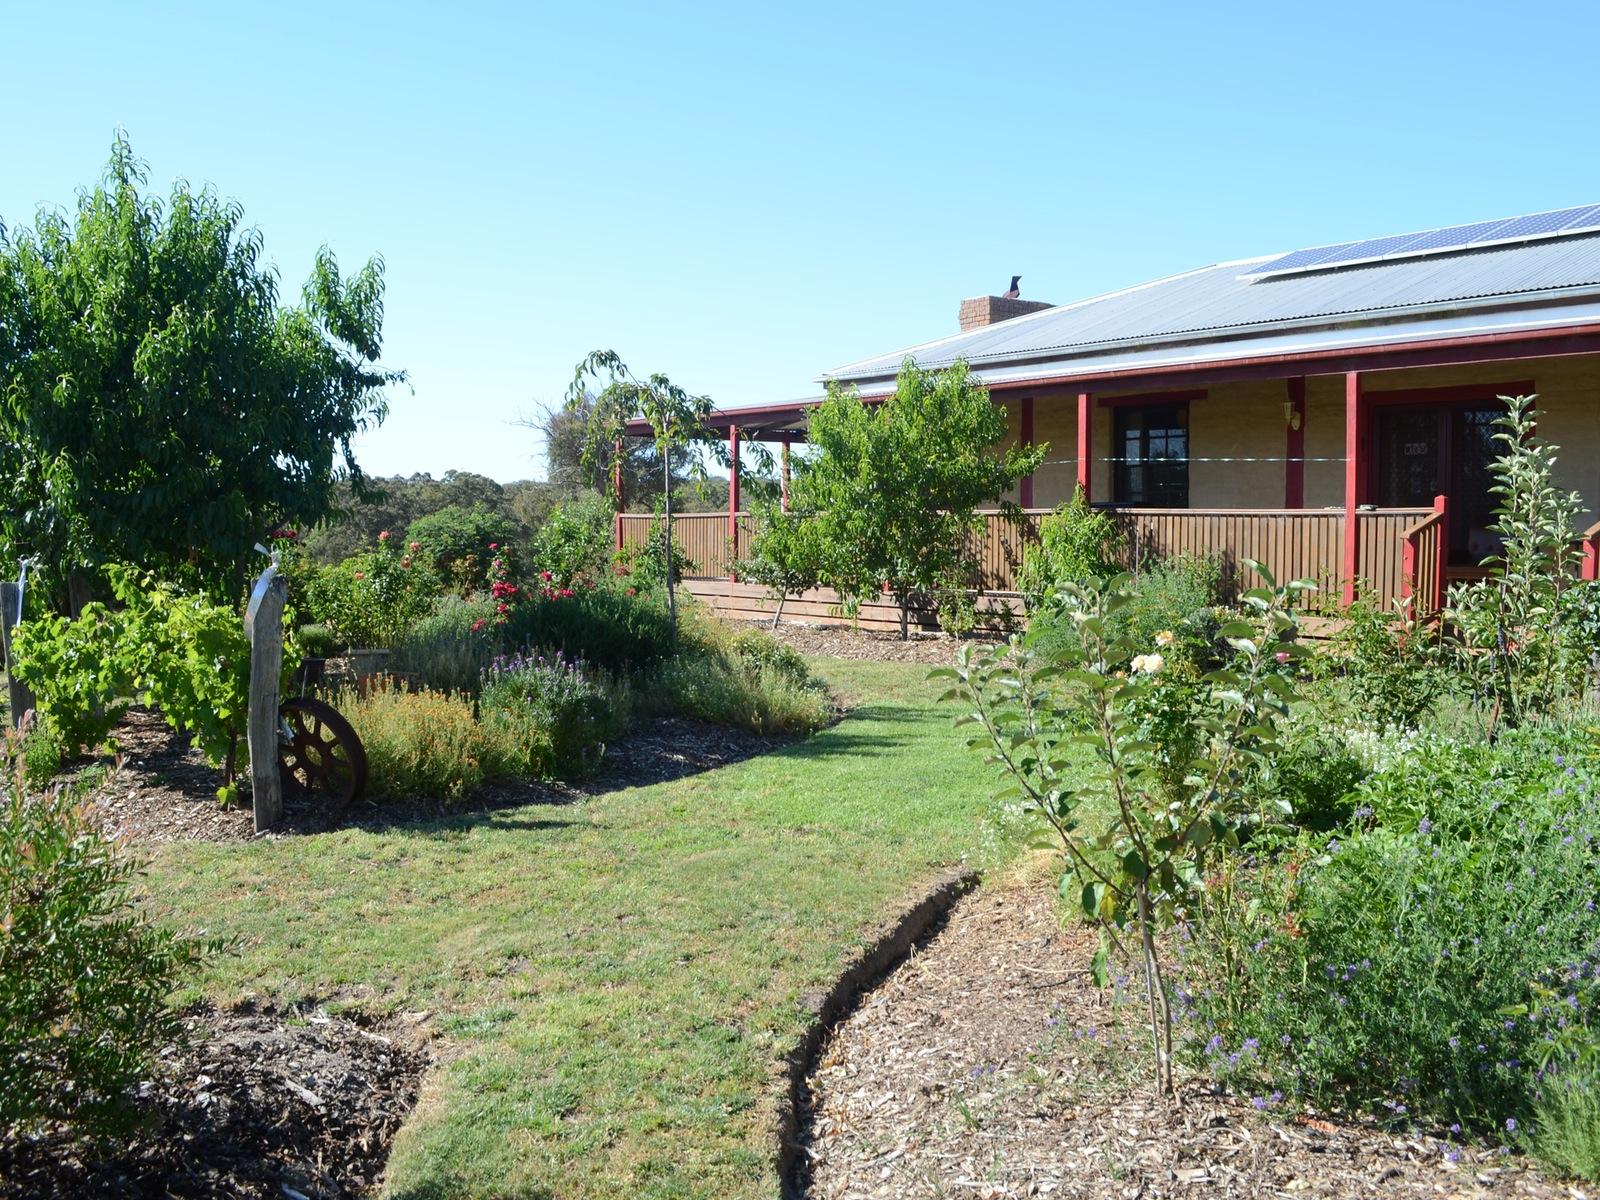 Enjoy the Gardens at 'Mureybet'